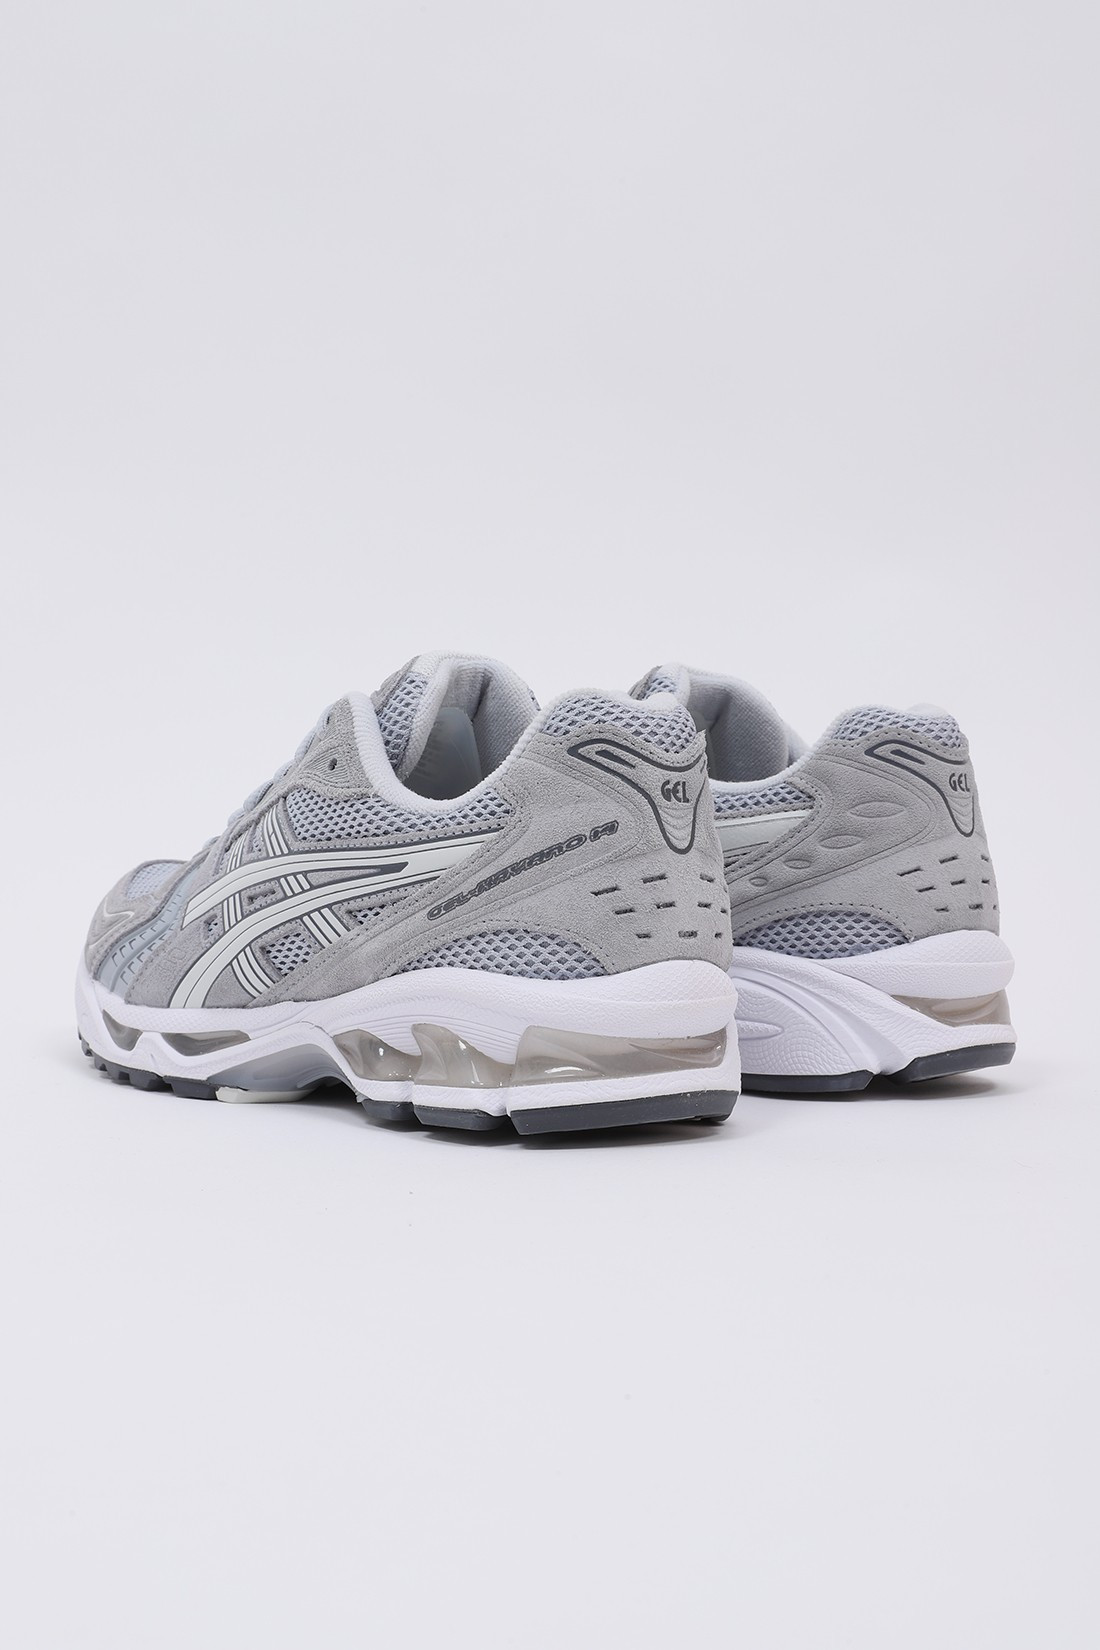 ASICS / Gel kayano 14 Piedmont grey